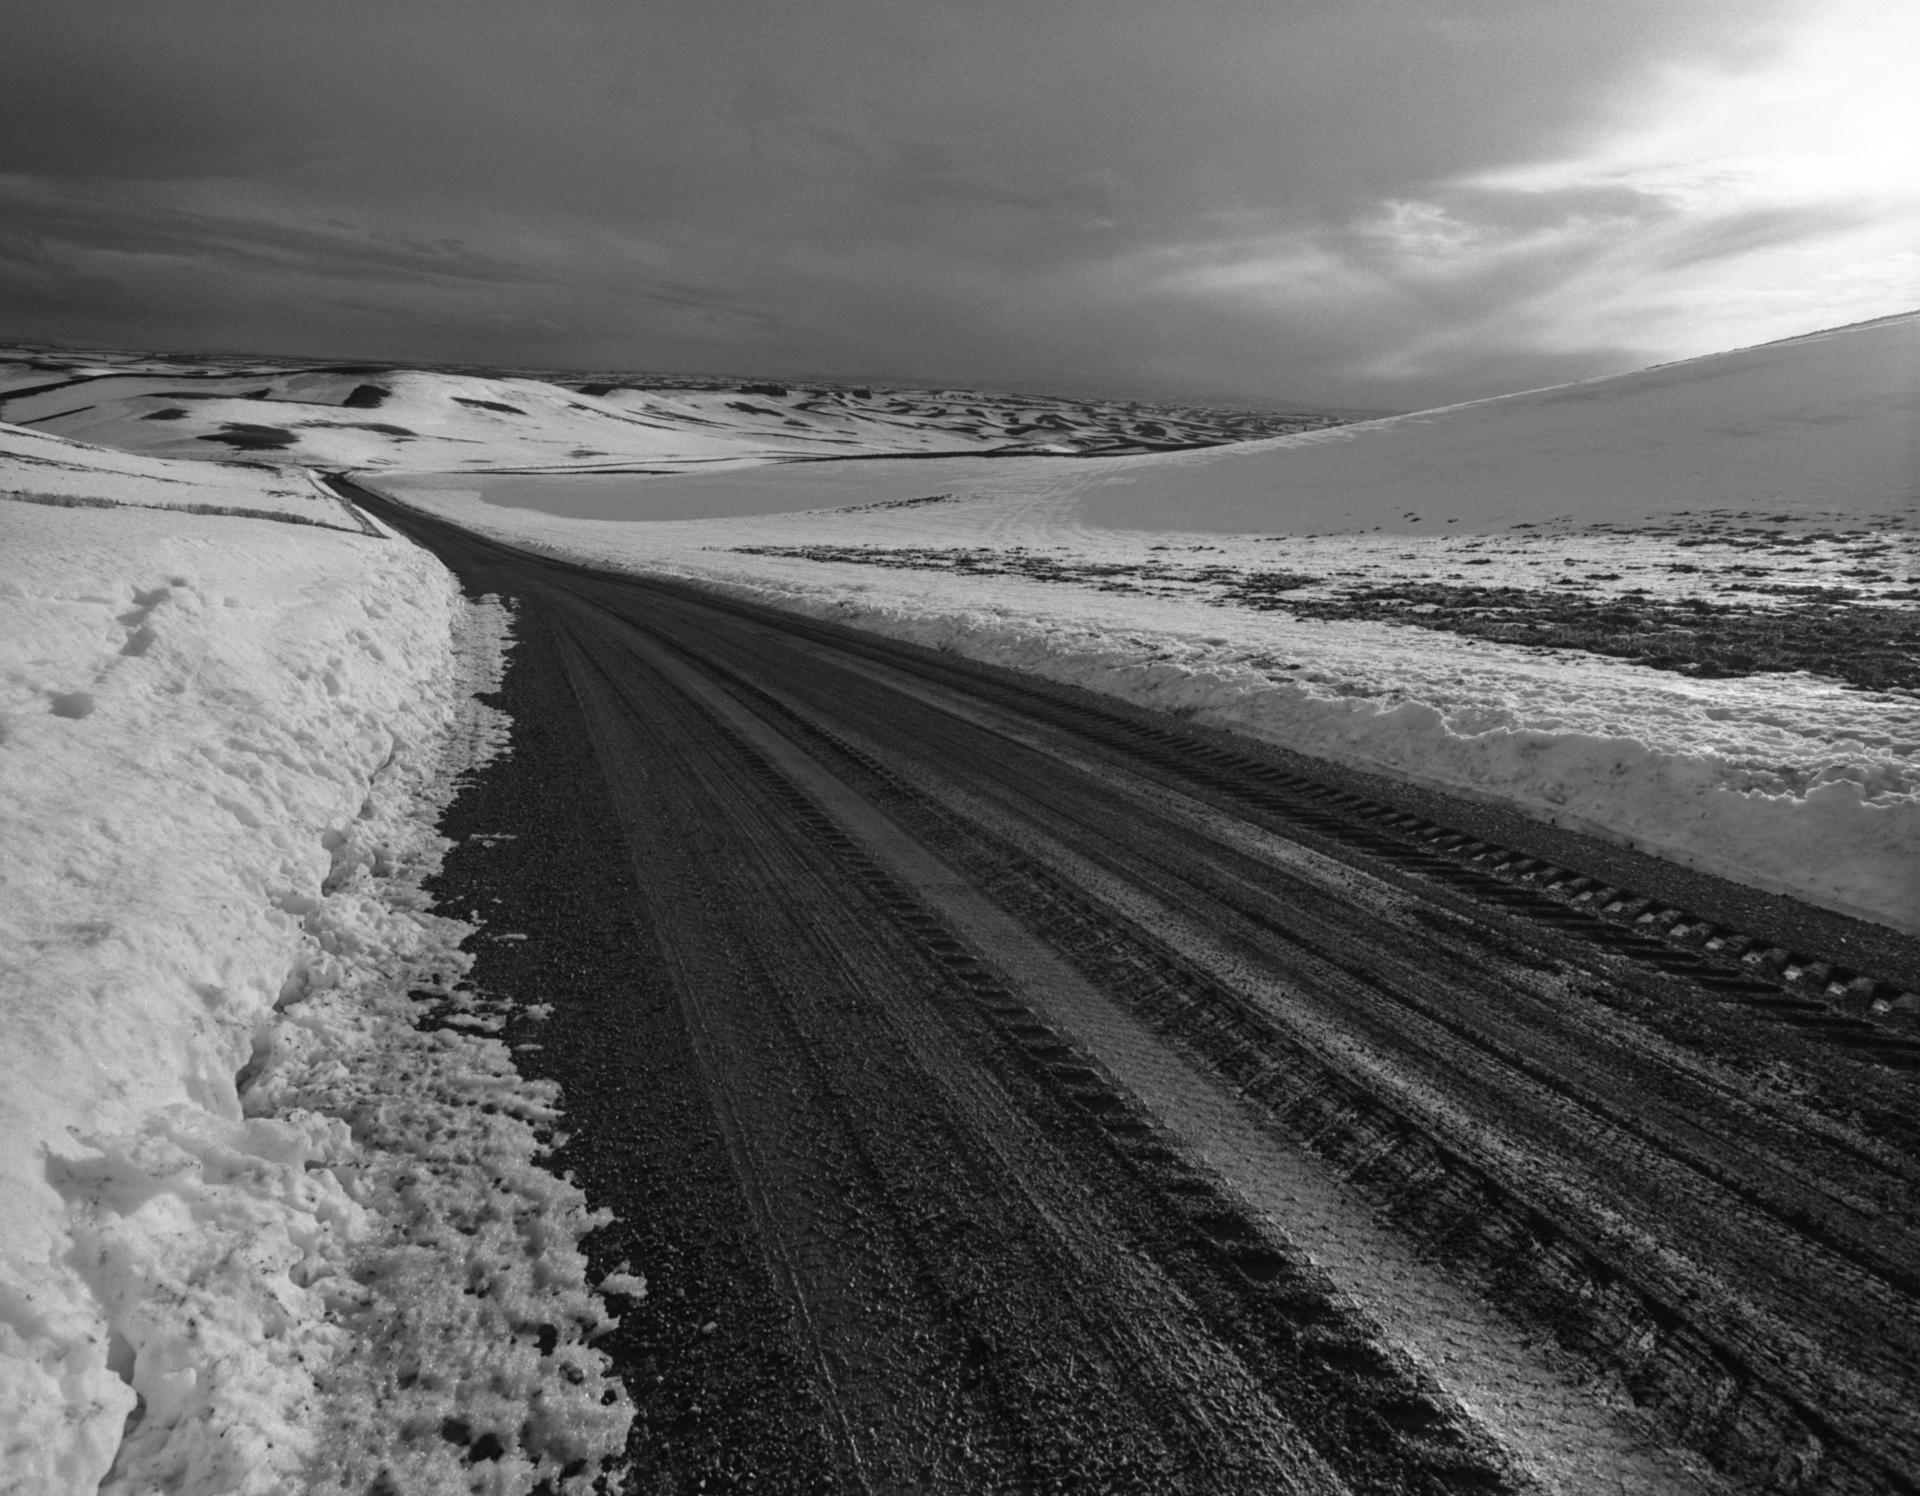 Somewhere on the Idaho/Washington border. Neopan 400 on the Pentax 67.